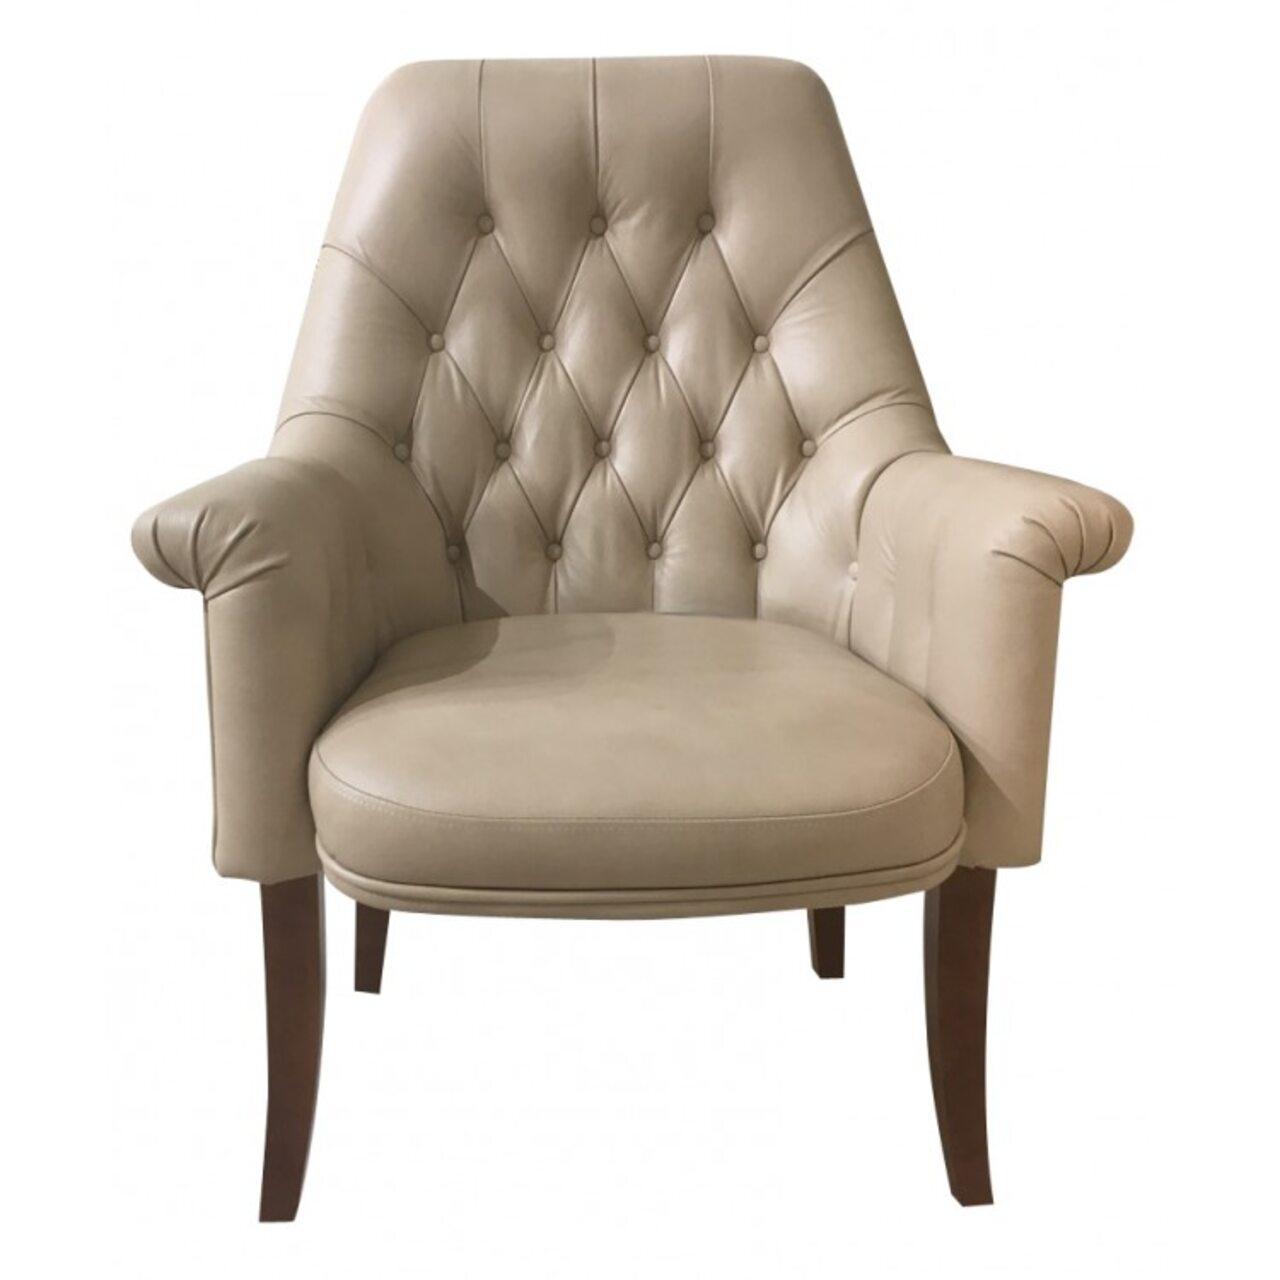 Классический стул Бруно-G - фото 2